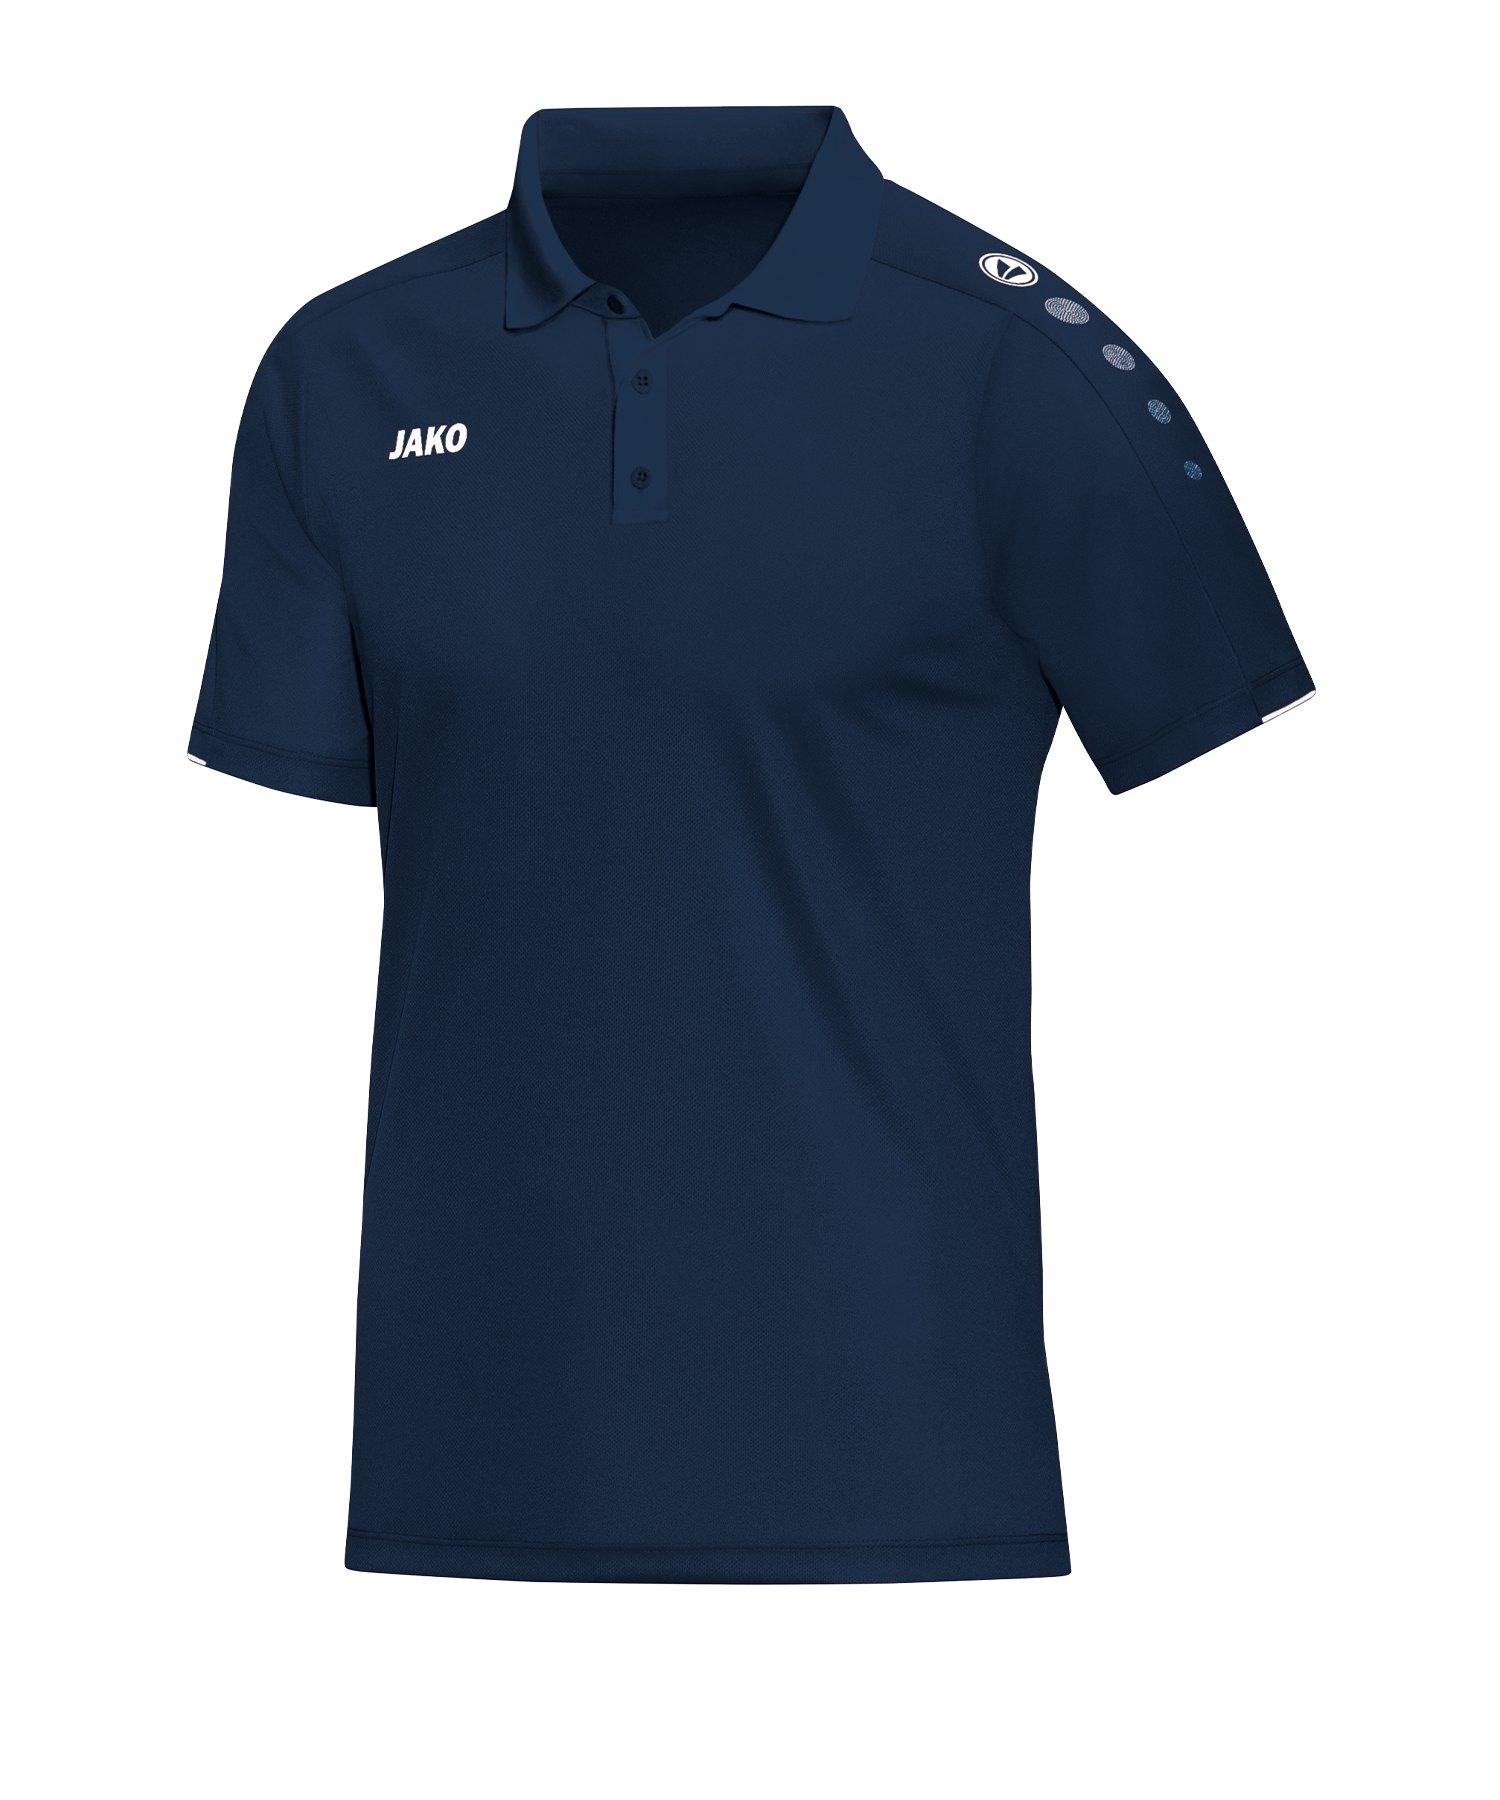 Jako Classico Poloshirt Damen Blau F09 - Blau